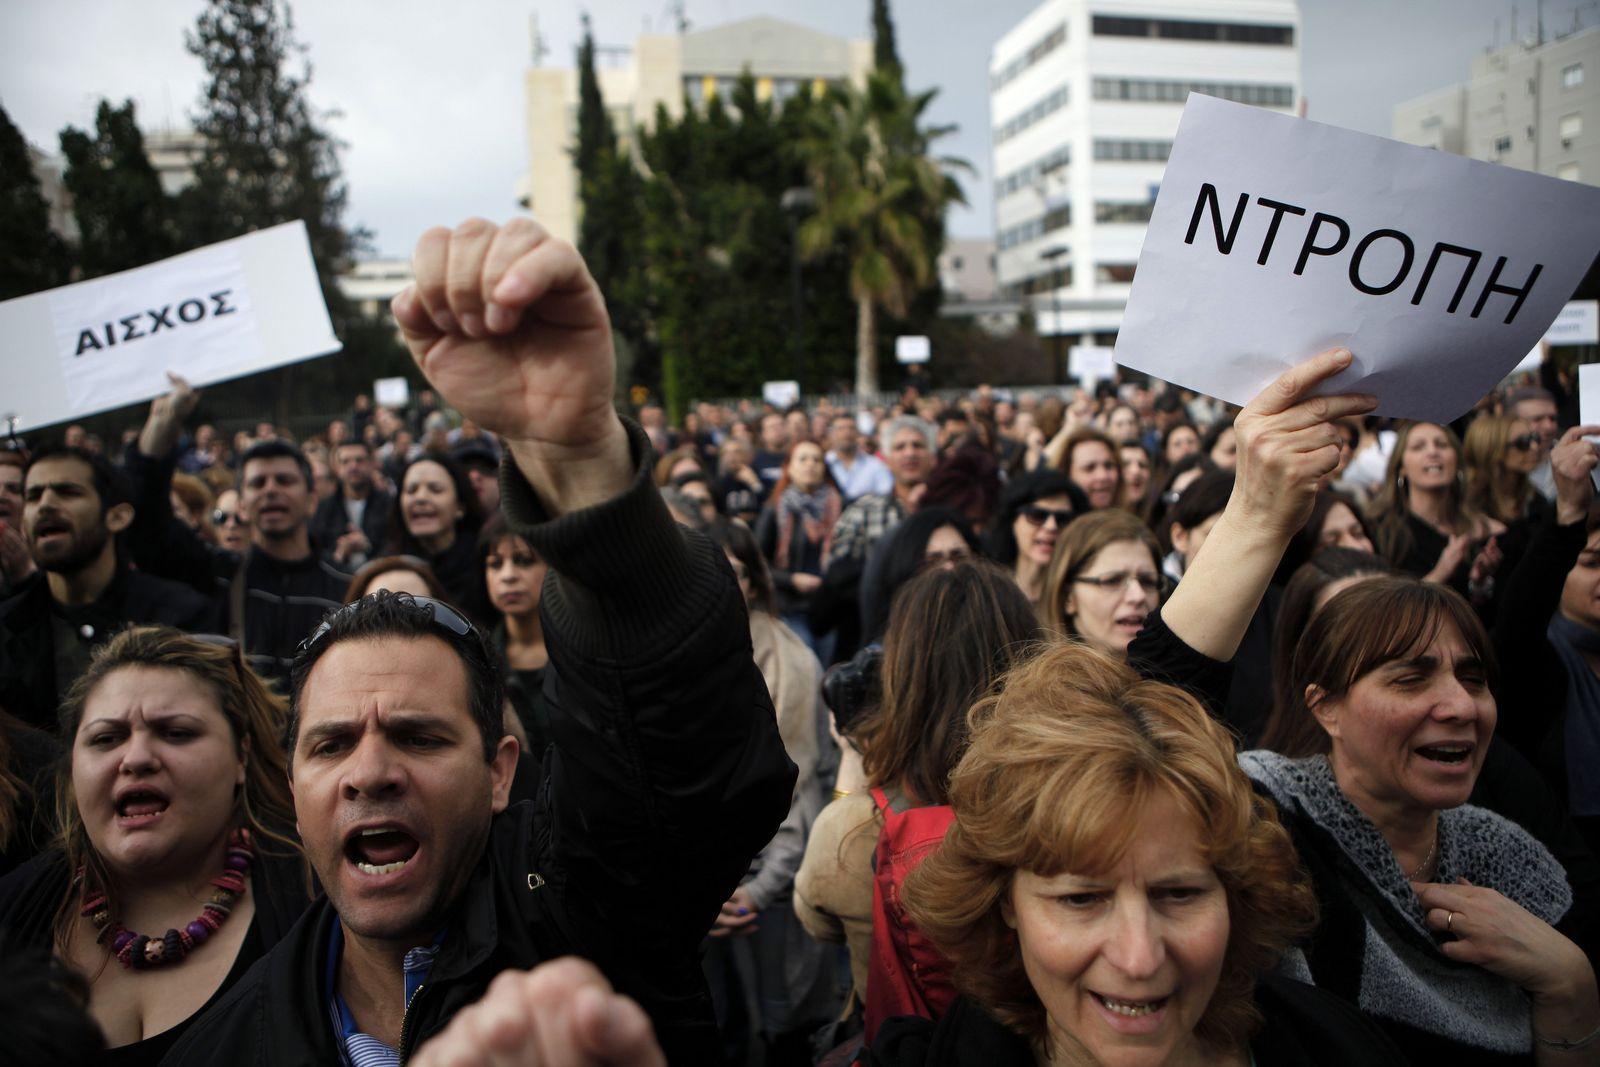 Zypern / Bank of Cyprus / Proteste